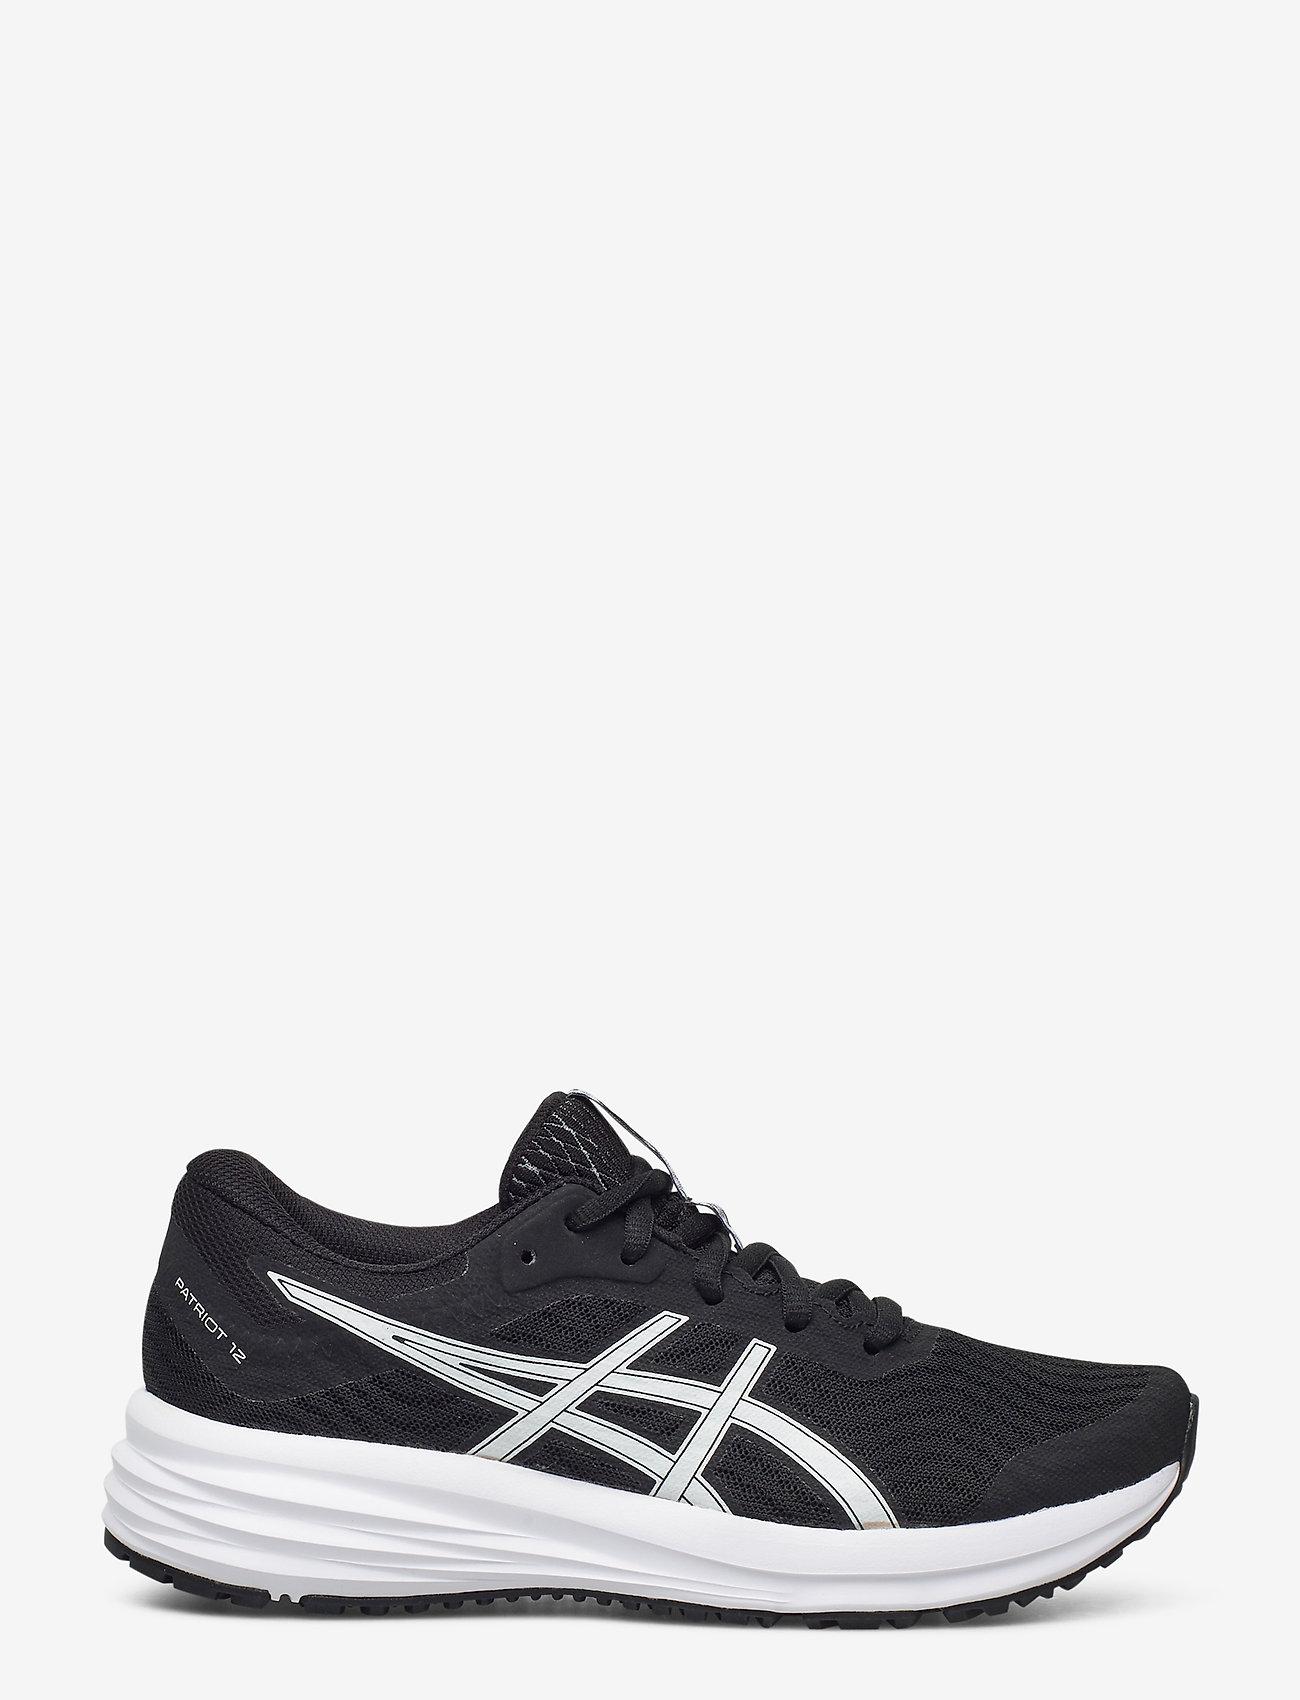 Asics - PATRIOT 12 - running shoes - black/white - 1